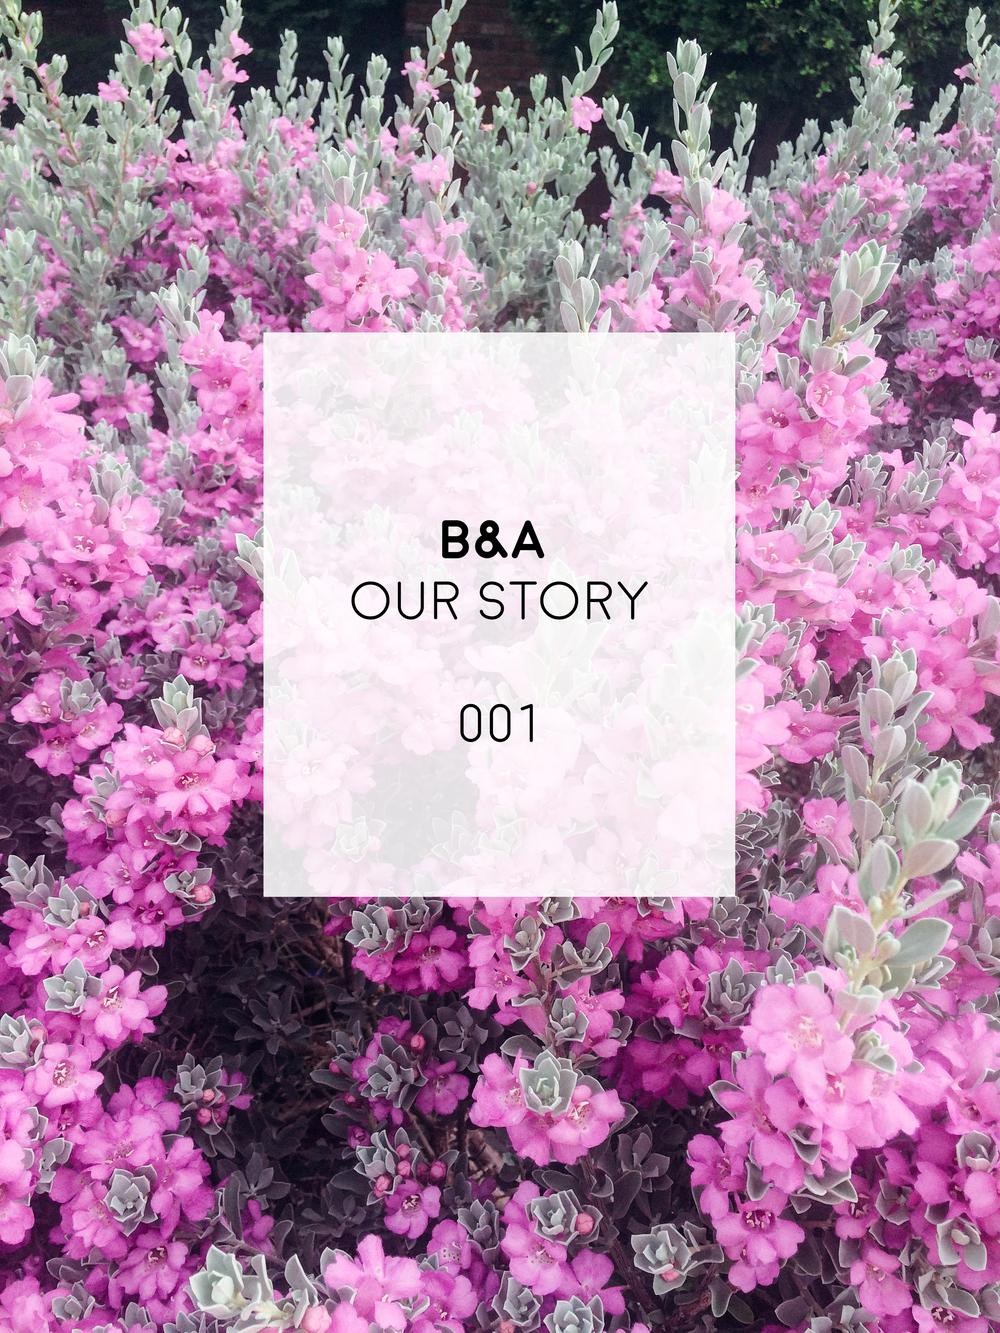 b&a love story 001 | ashleyjoanna.com